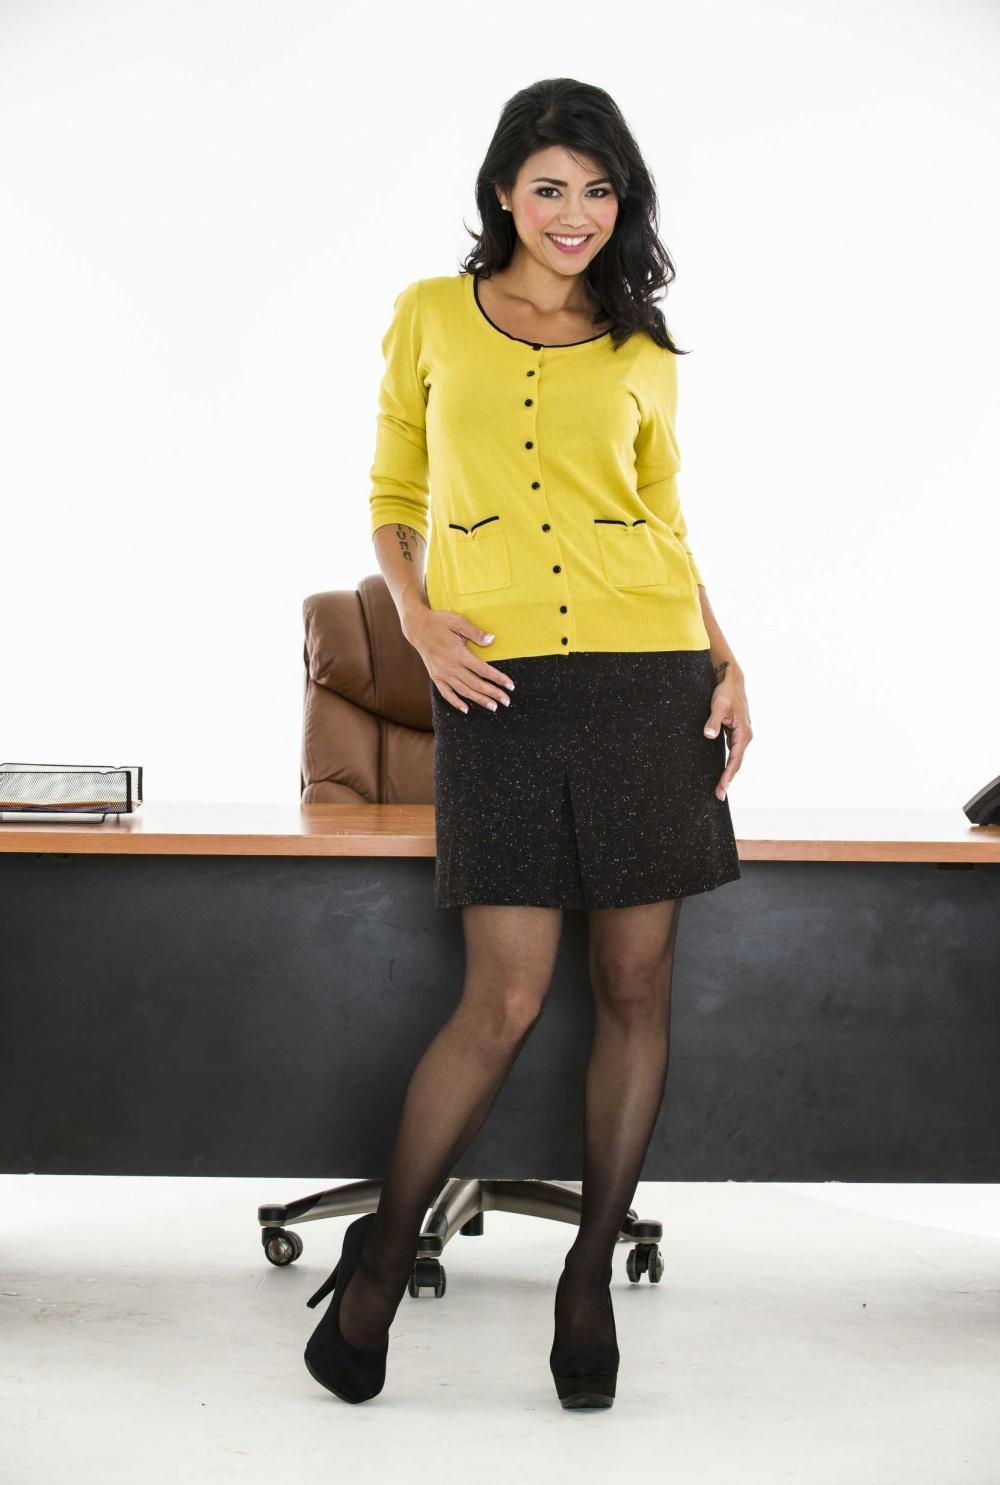 Asian office worker Dana Vespoli strips off business clothes for easier money № 636191 загрузить